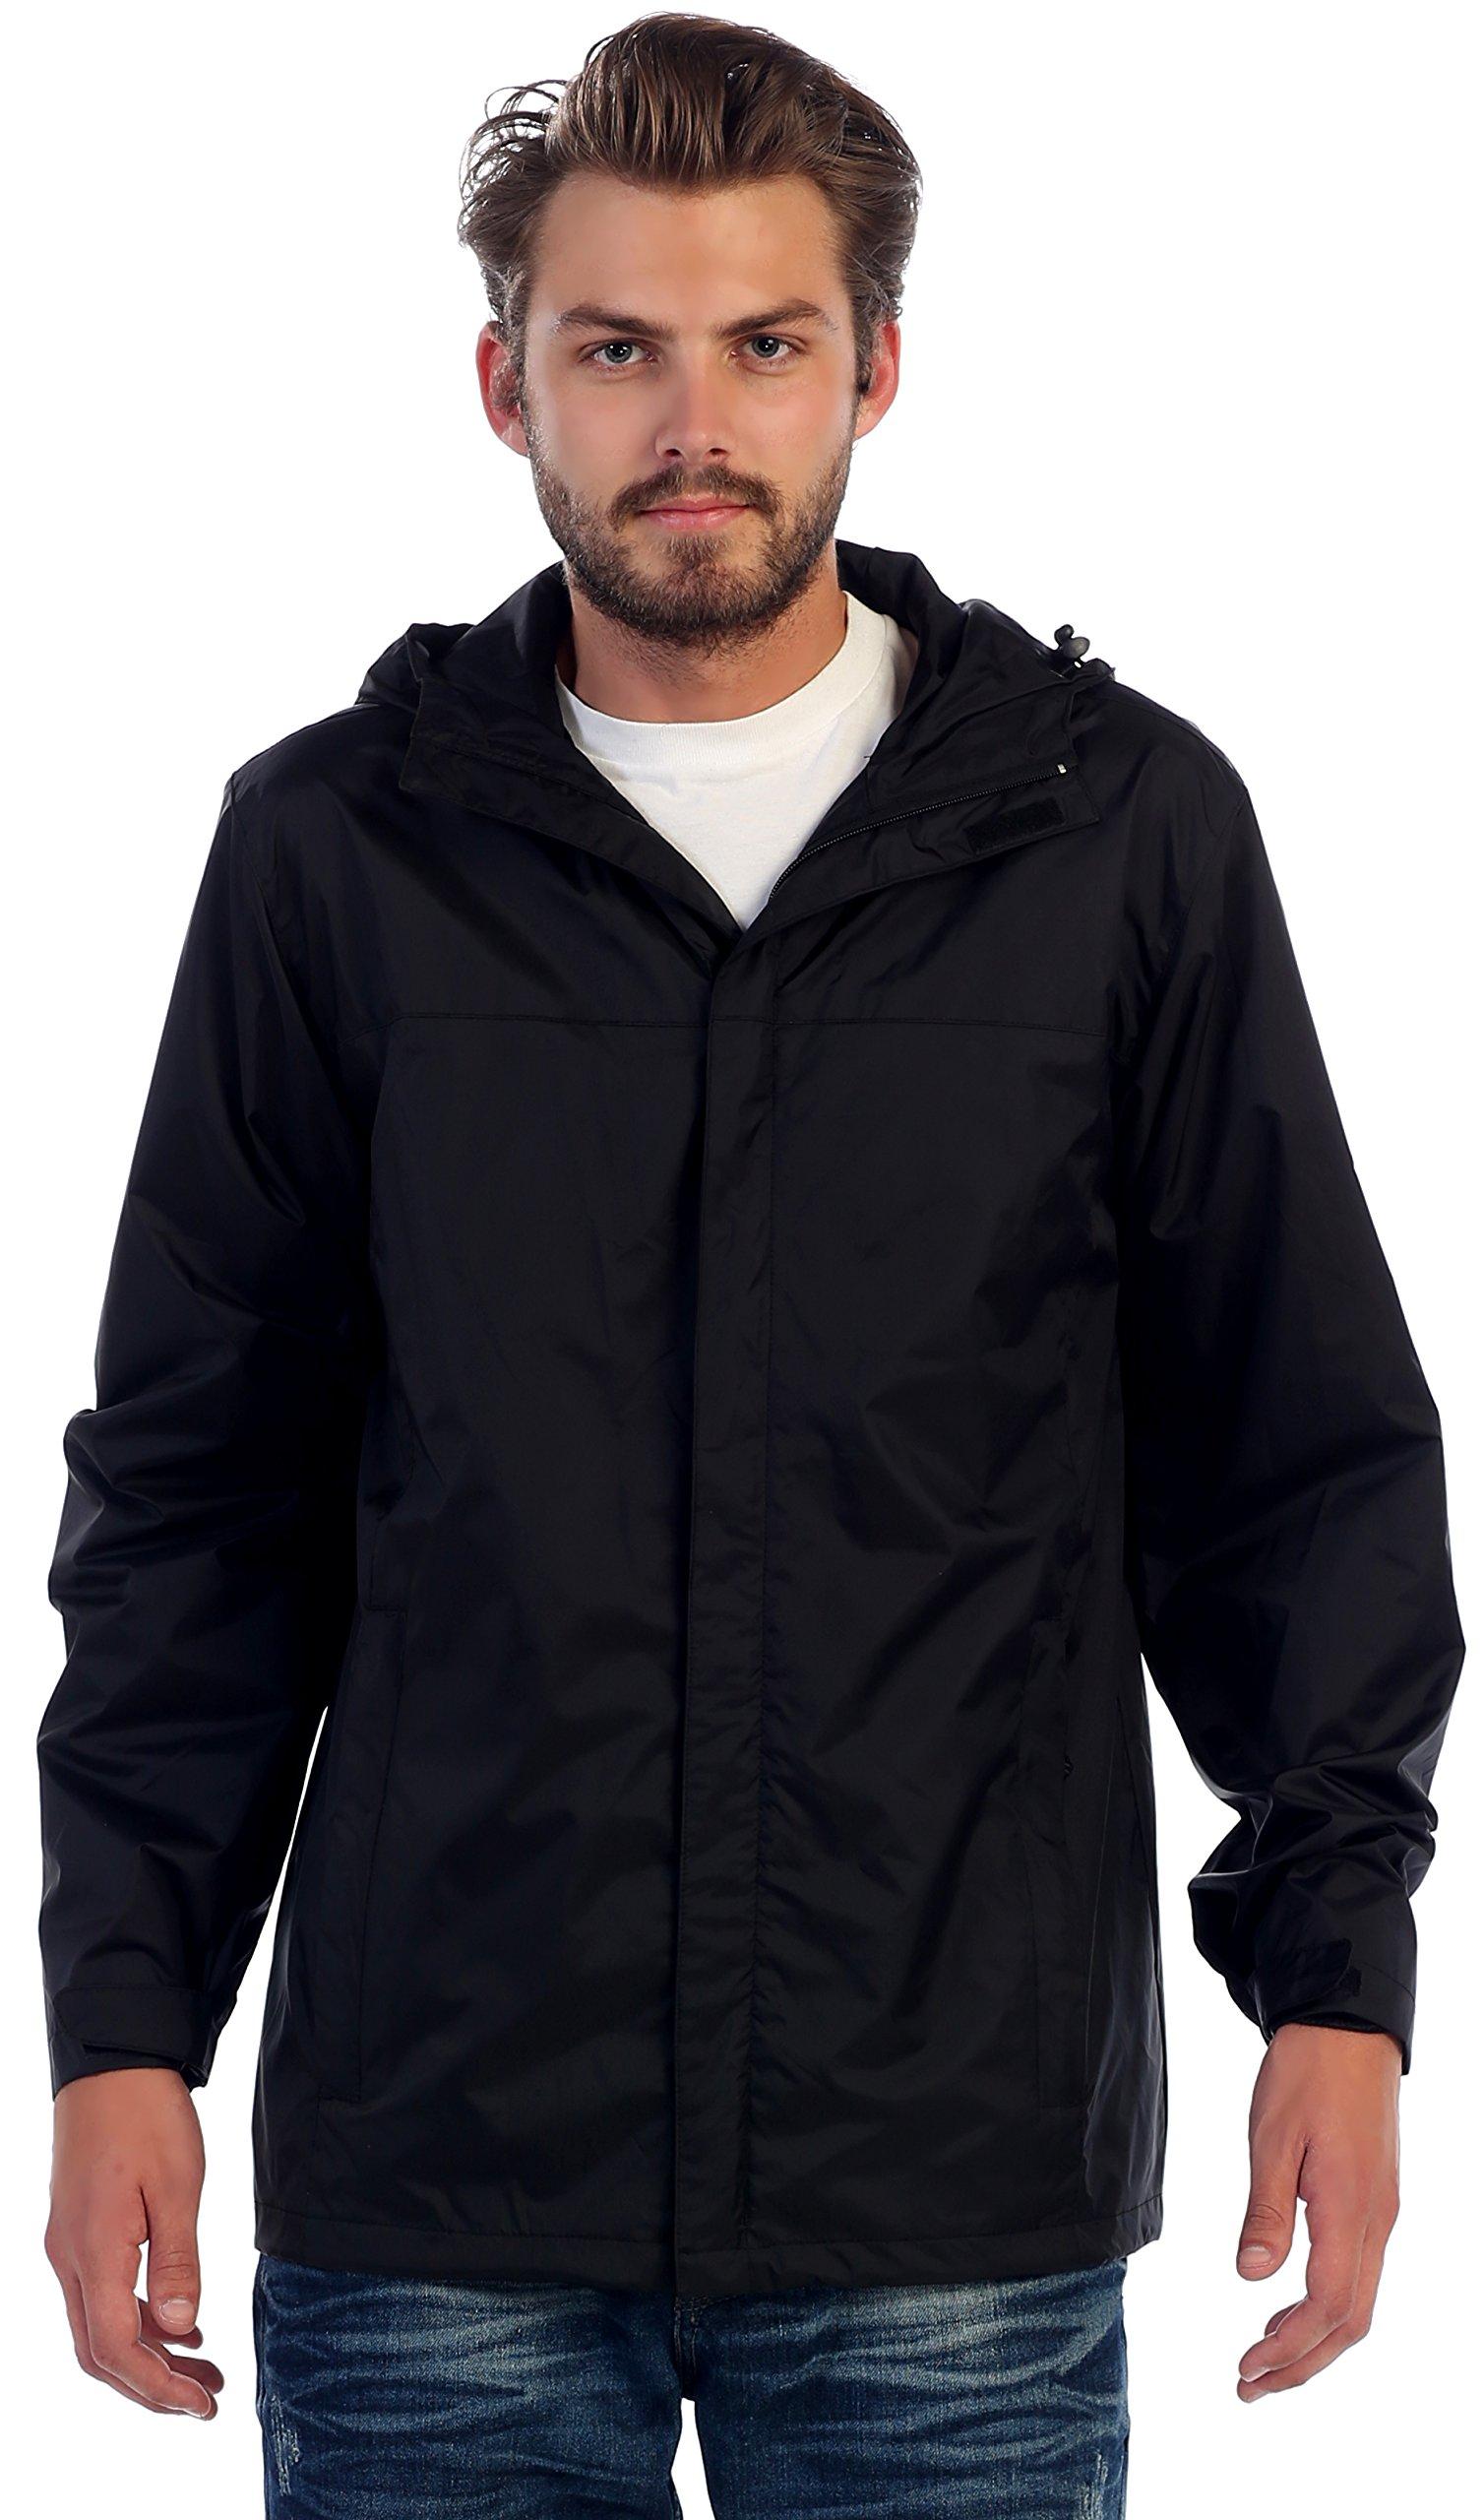 Gioberti Men's Waterproof Rain Jacket, Black, M by Gioberti